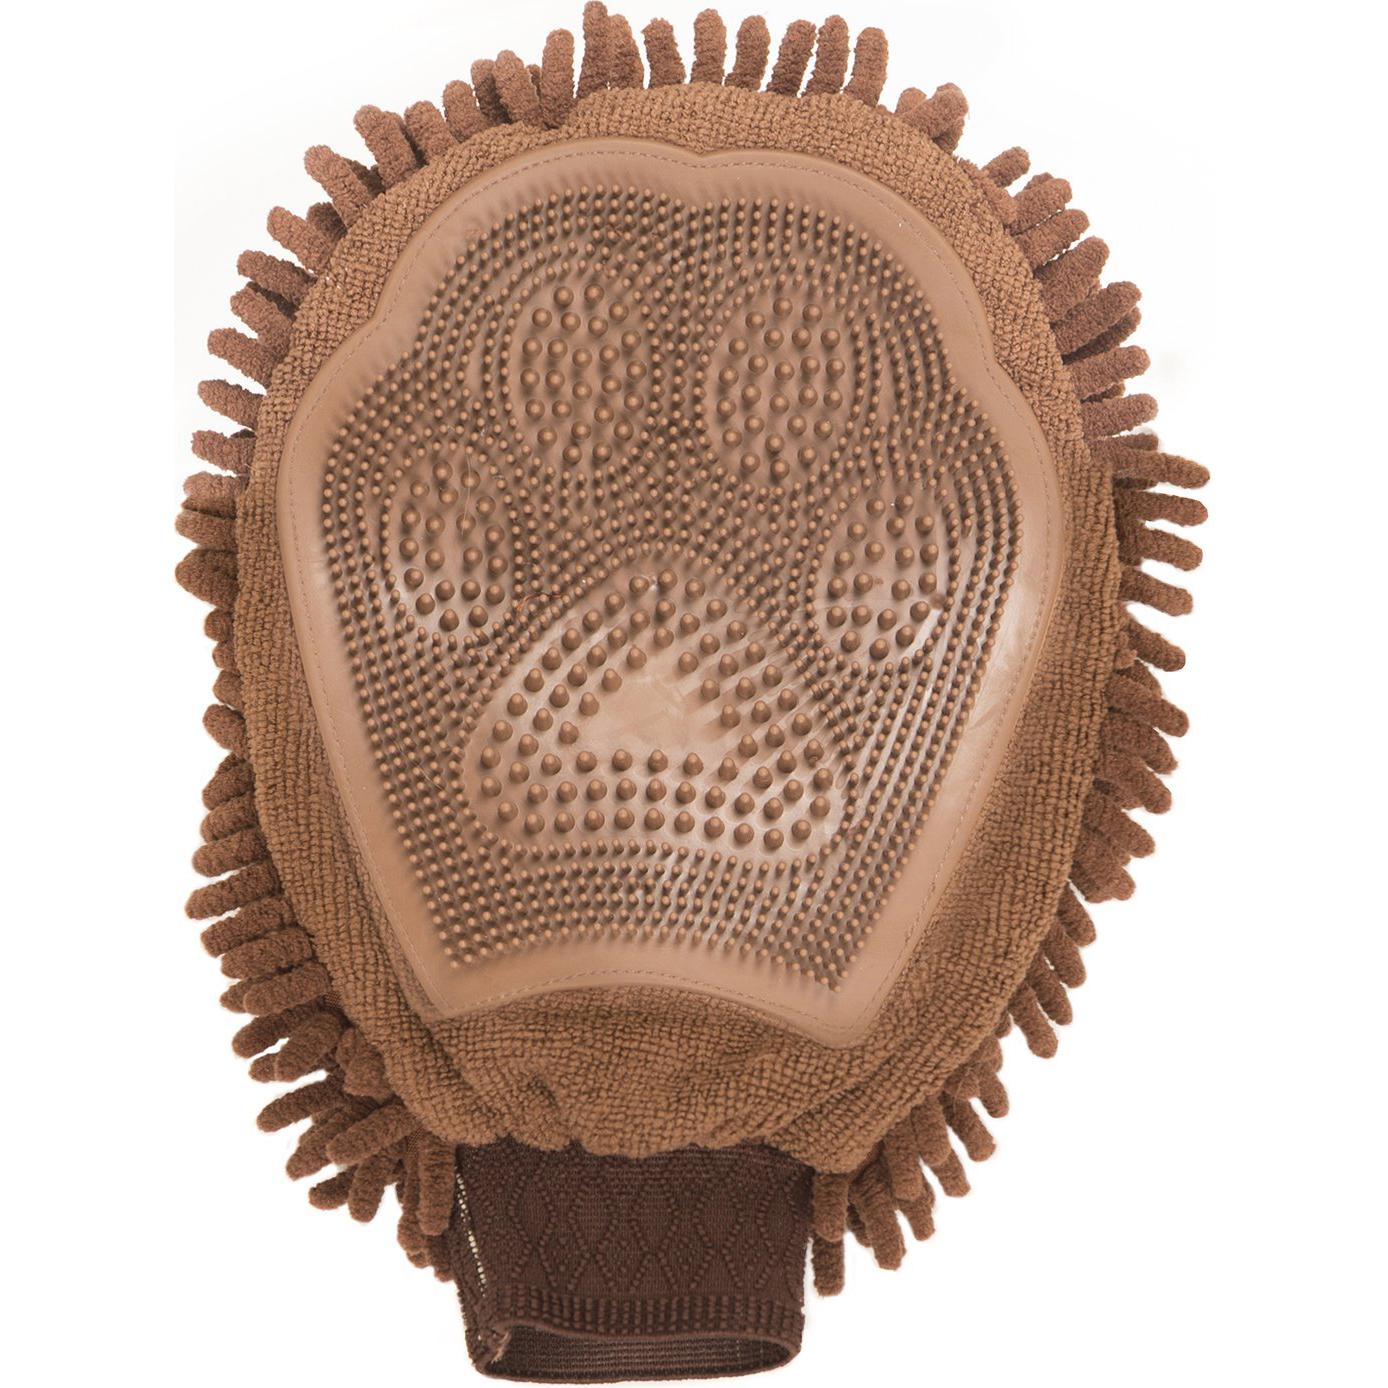 Перчатка для груминга Dog Gone Smart Grooming Mitt коричневая 25х18 см